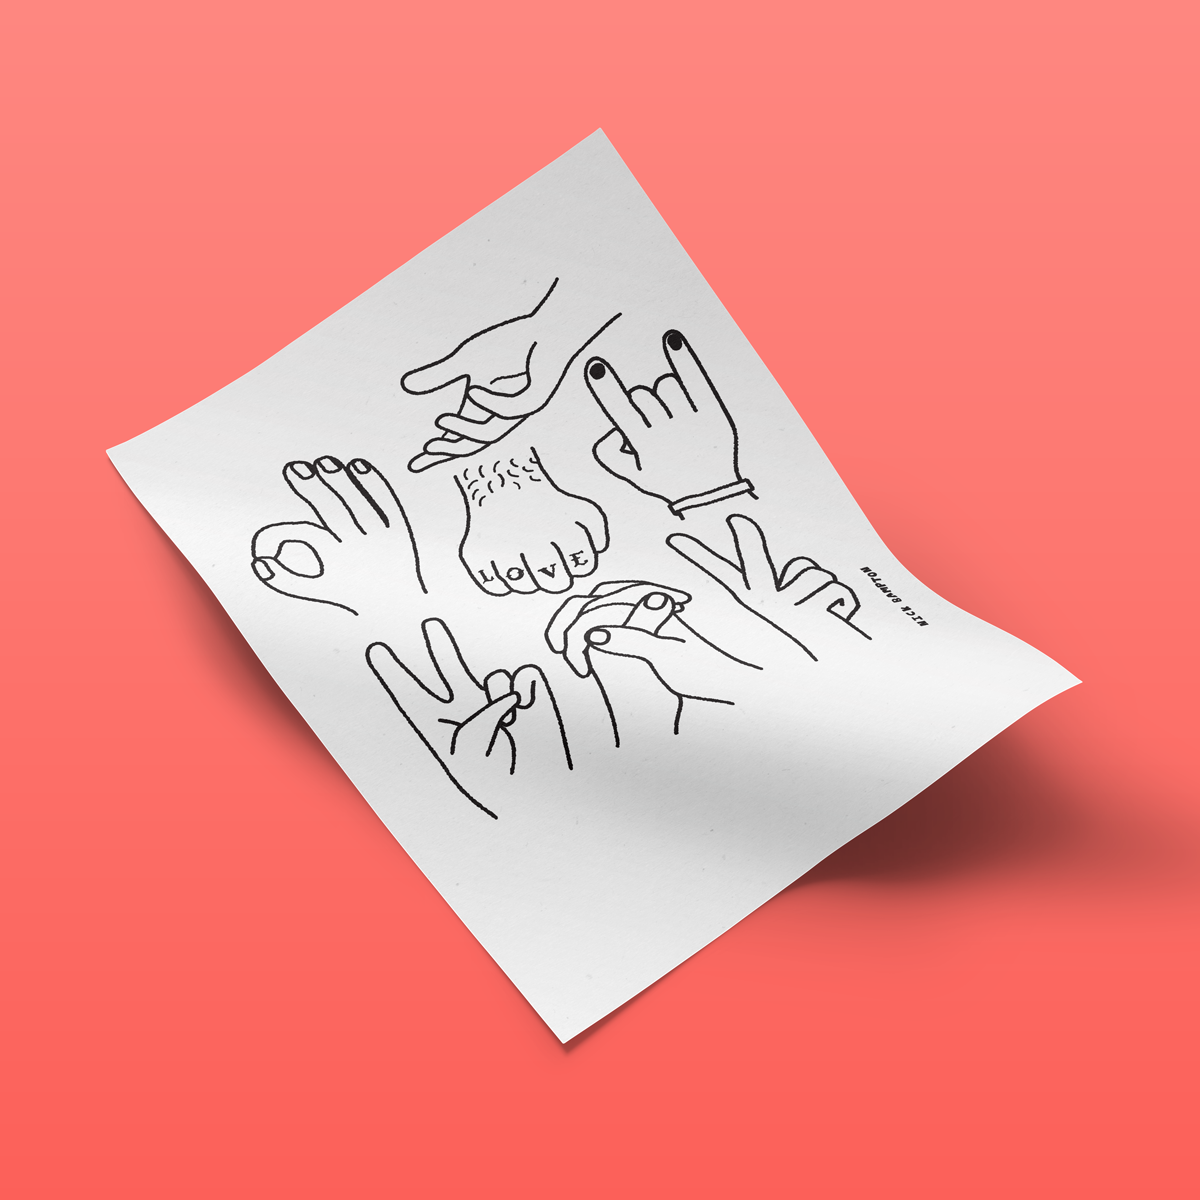 KALLE_HANDS_ARTPRINT_MOCKUP.png